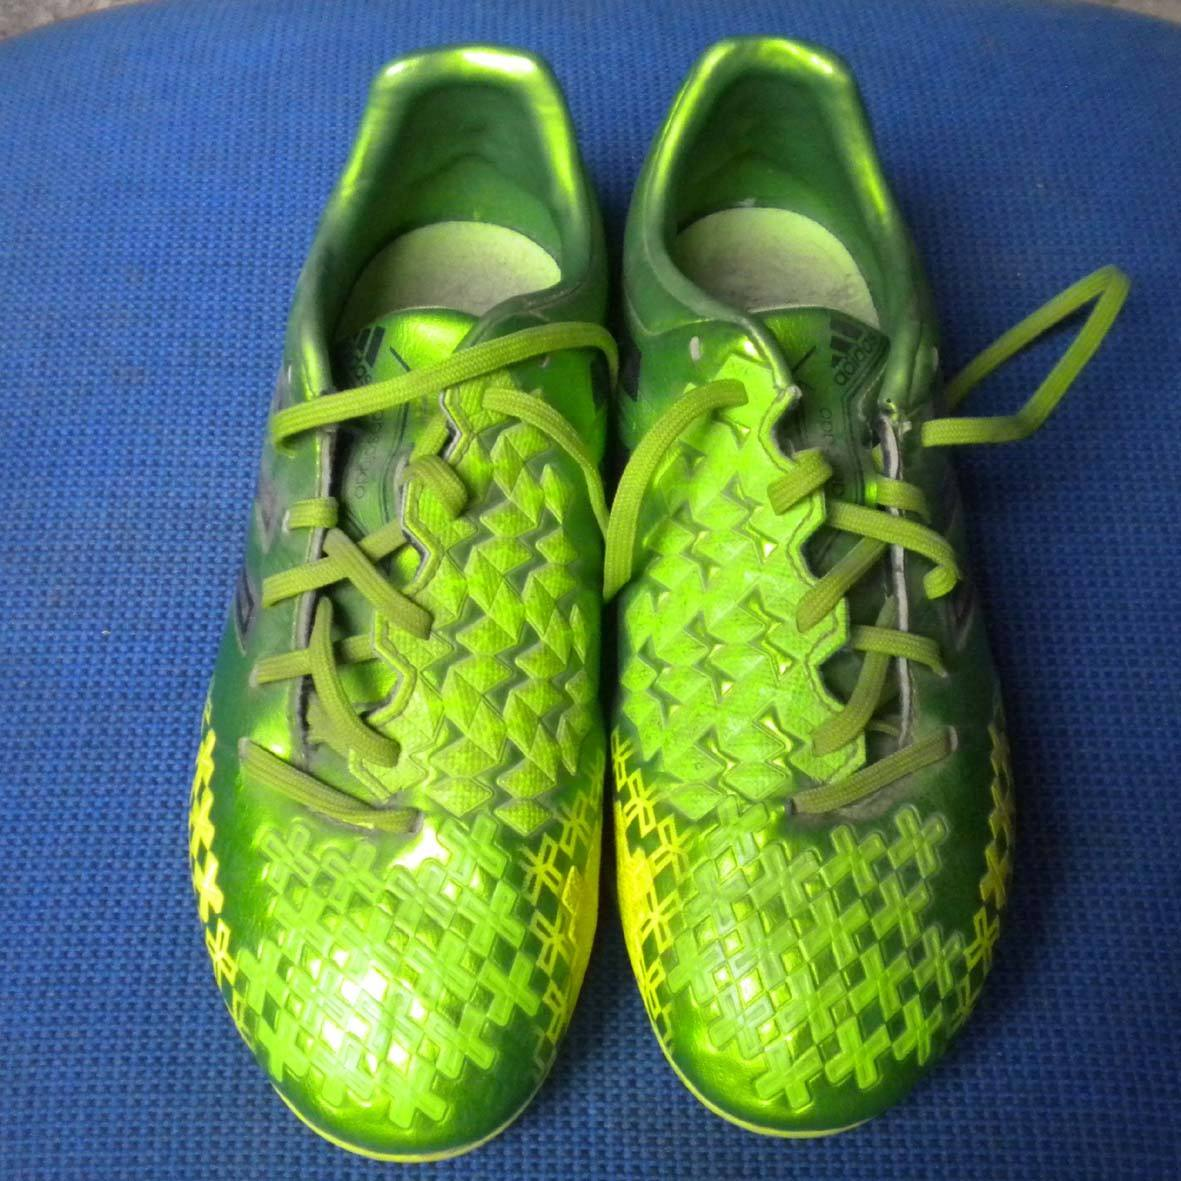 Zapatos De Futbol adidas Predator Talla 3 Cl 31 2 Us Muy Poc ... eddffcd77d917